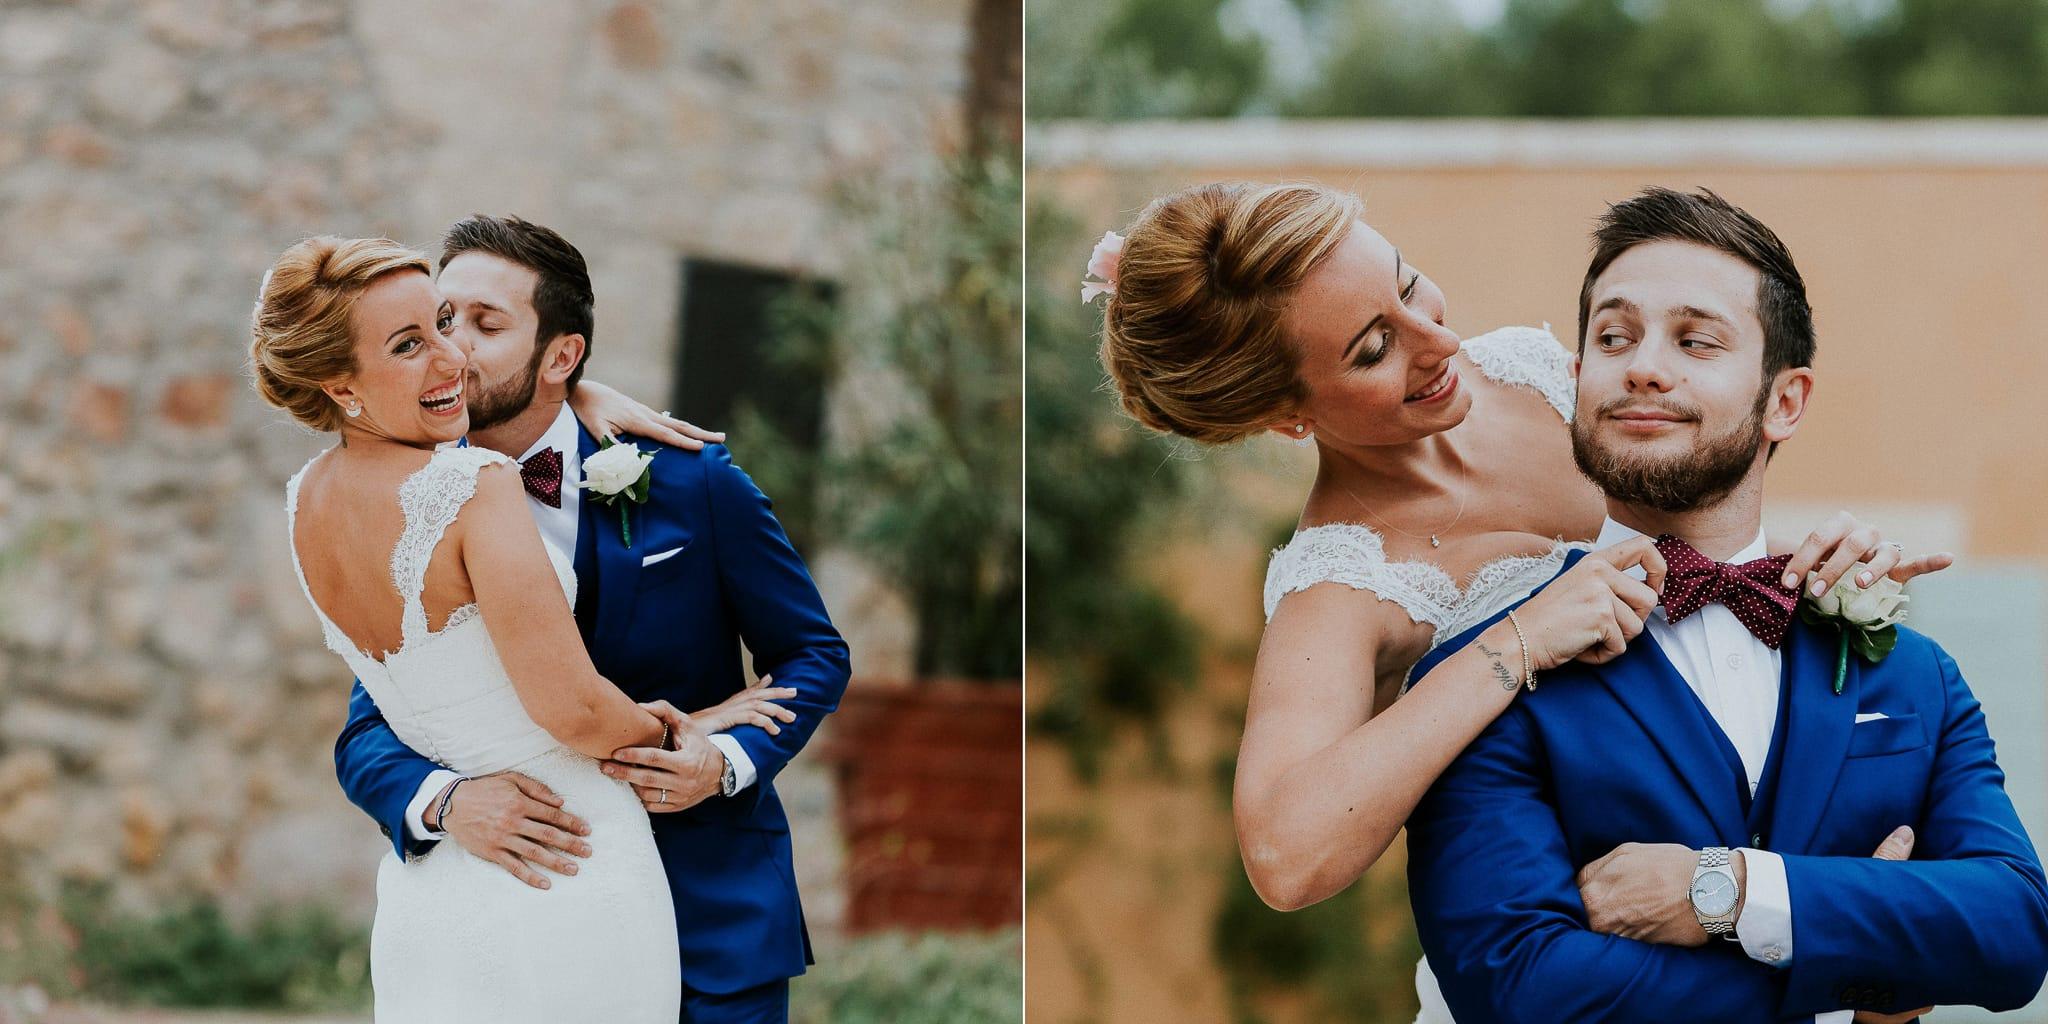 Costi-Moiceanu-Photographer-CM-Photography-Wedding-Mariage-French-Riviera-Cote-D-Azur-Alpes-Maritimes-Weding-Album-Design-16